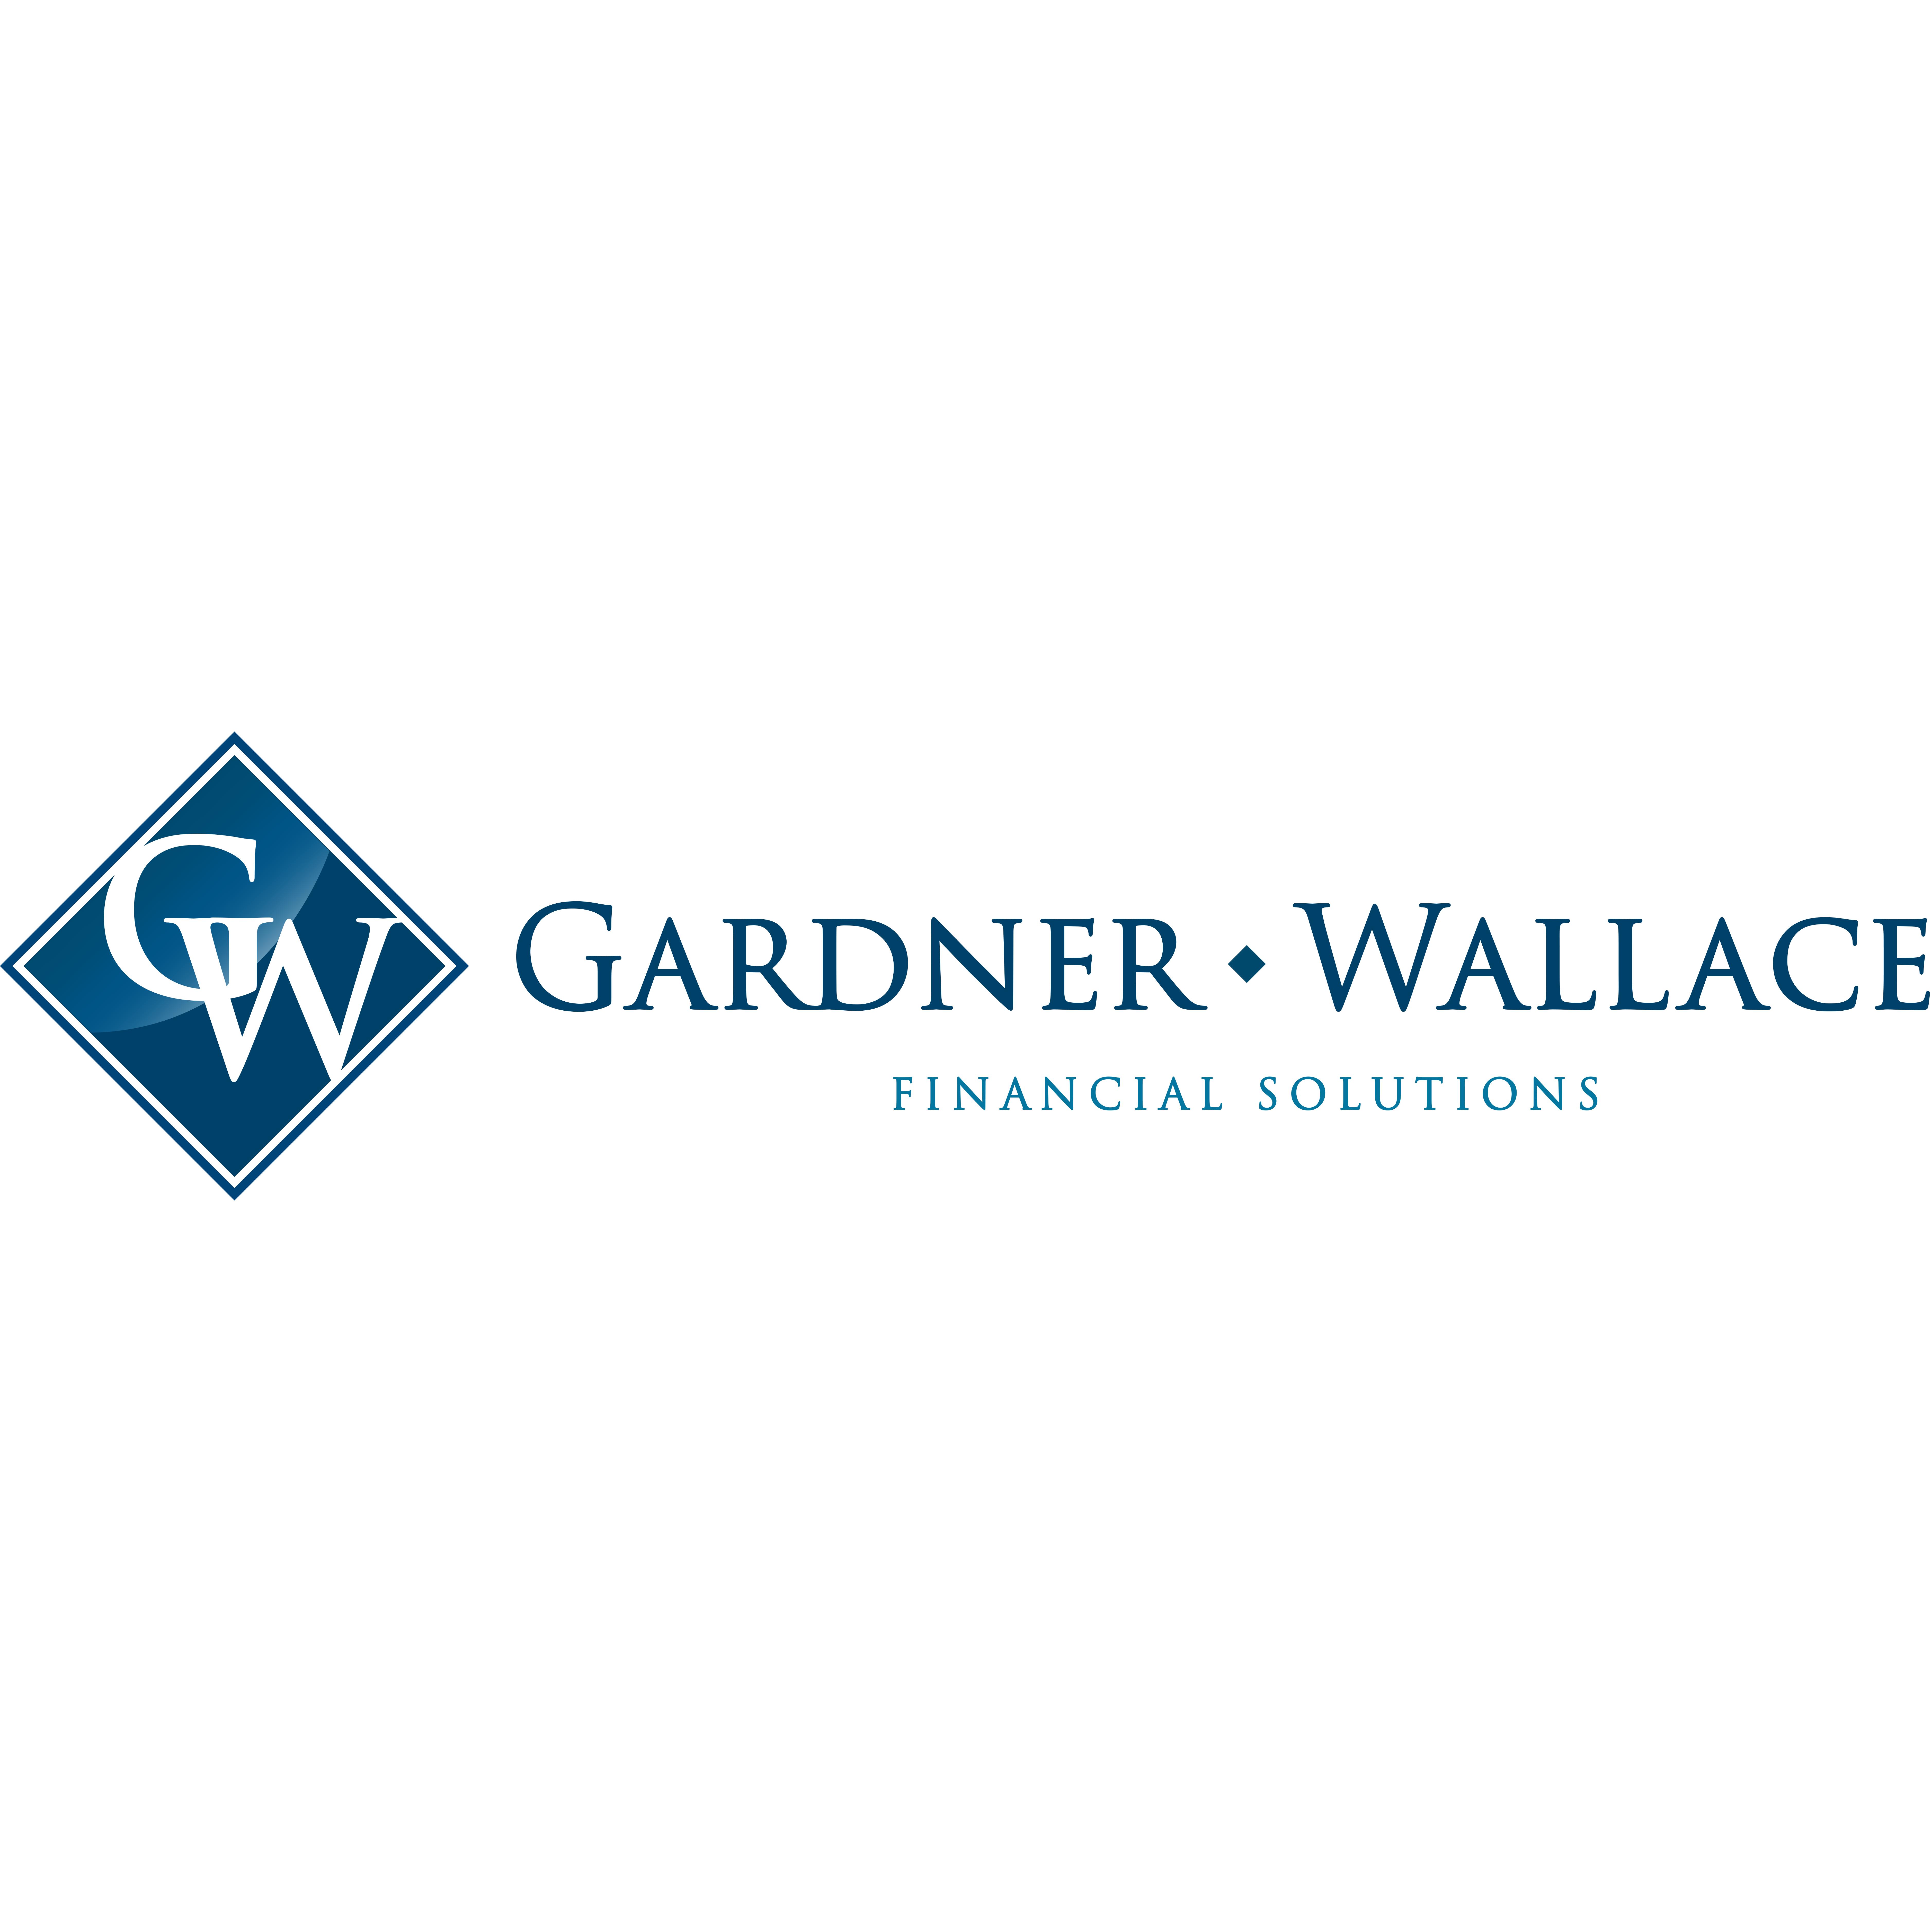 Gardner Wallace | Financial Advisor in Addison,Texas